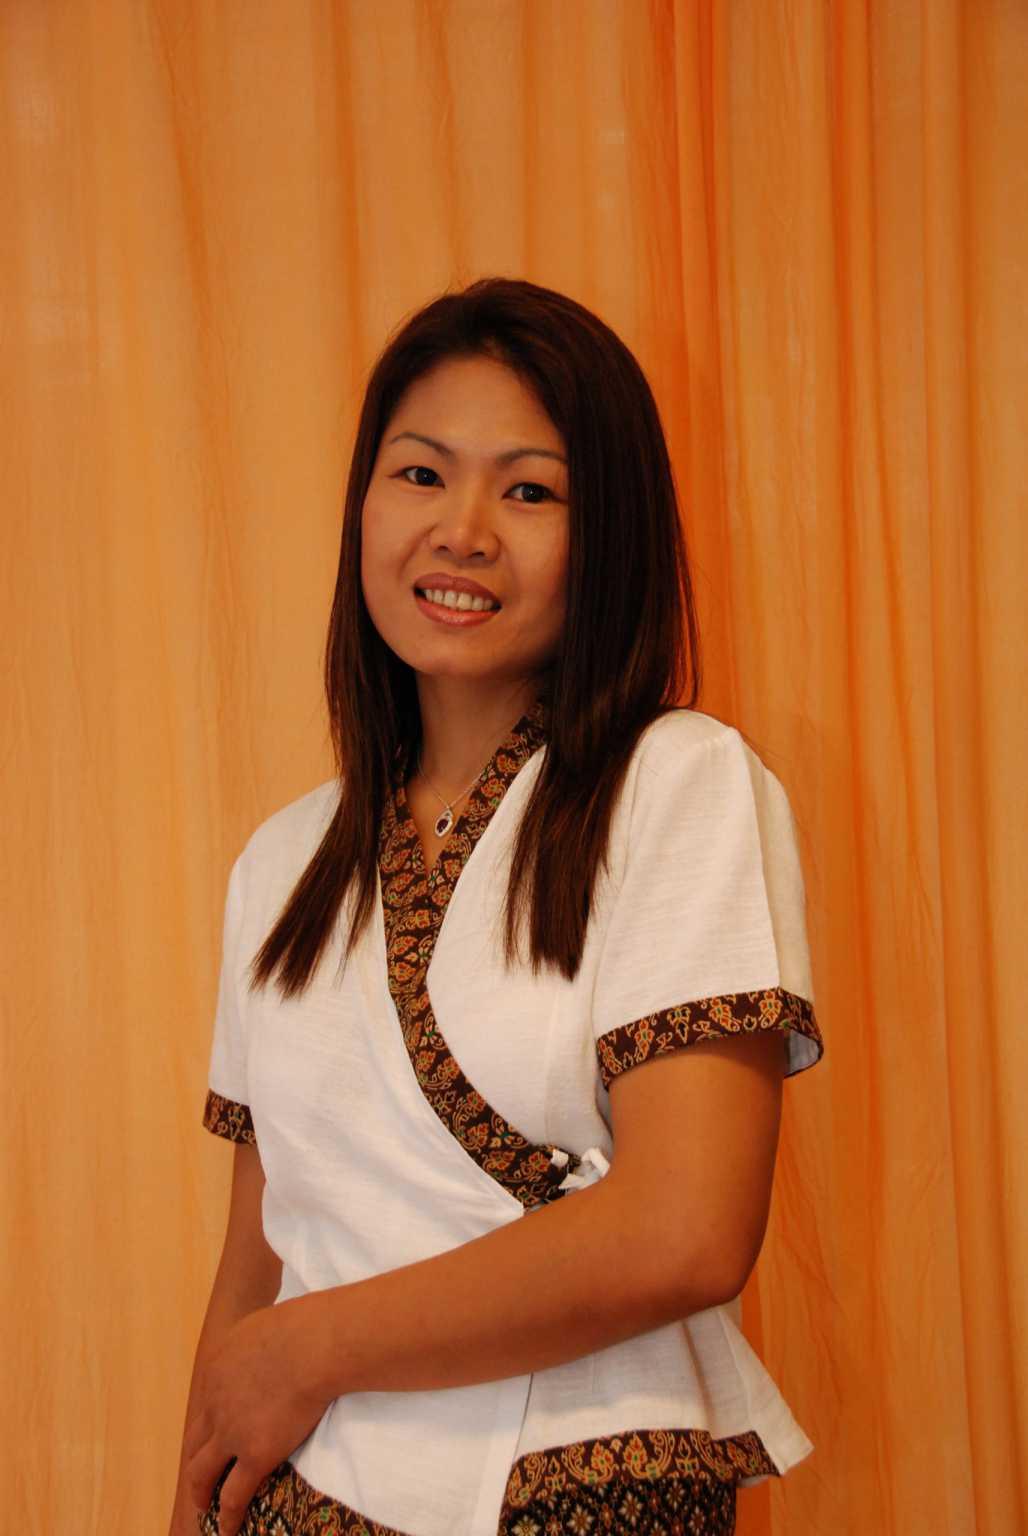 thai wellness massage bestil escort